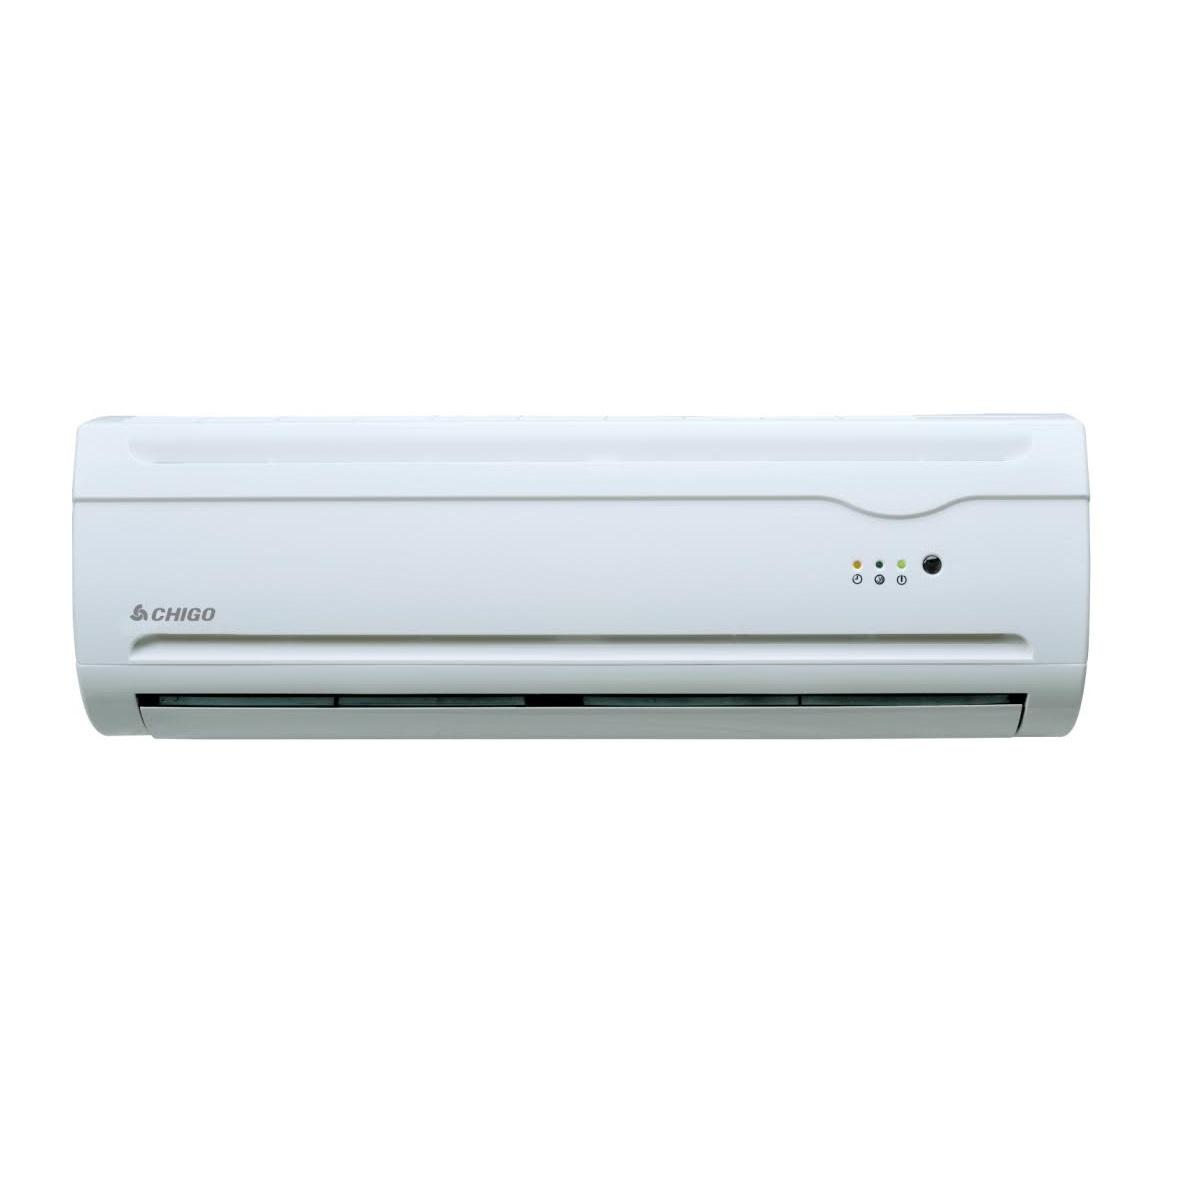 Chigo CS-25C2 1.0HP Split Type Air Conditioner White - thumbnail